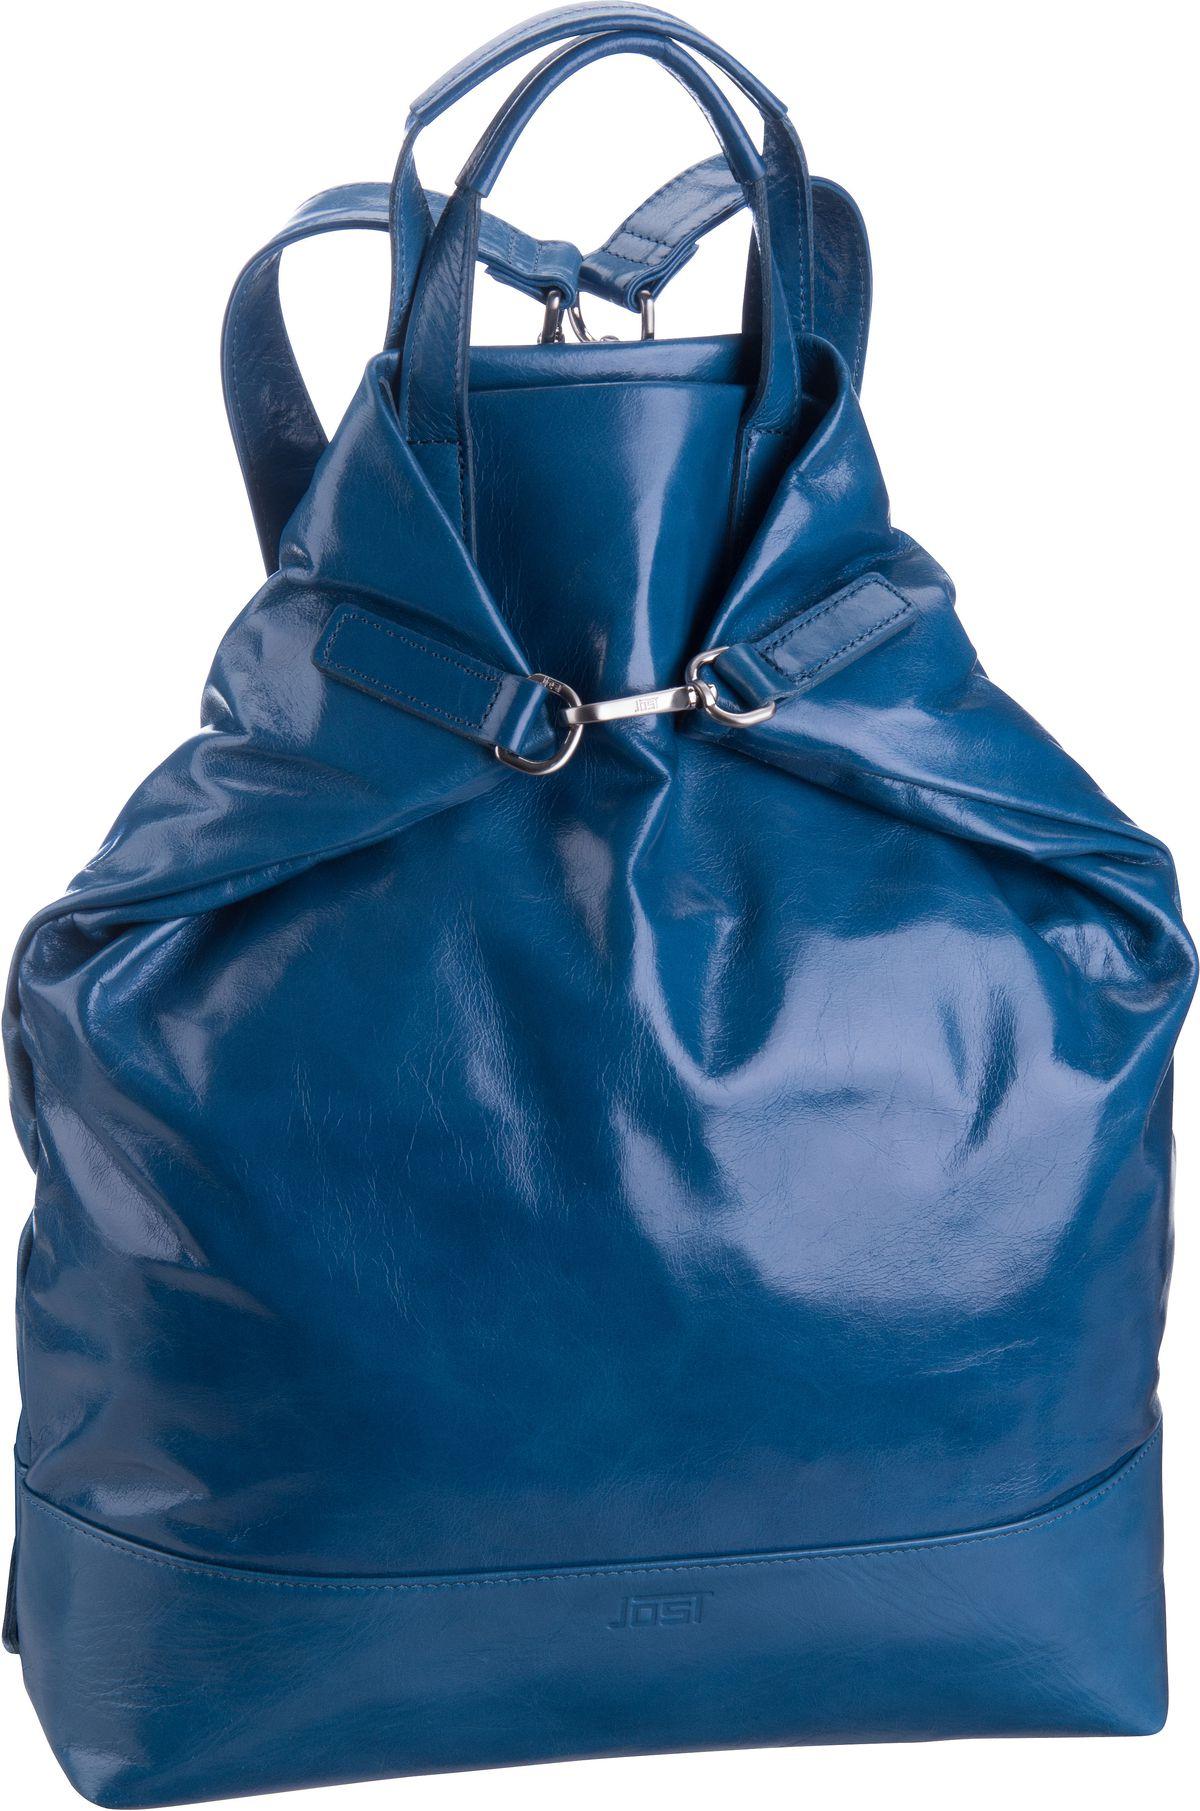 Rucksack / Daypack Boda 6632 X-Change Bag M Royalblue